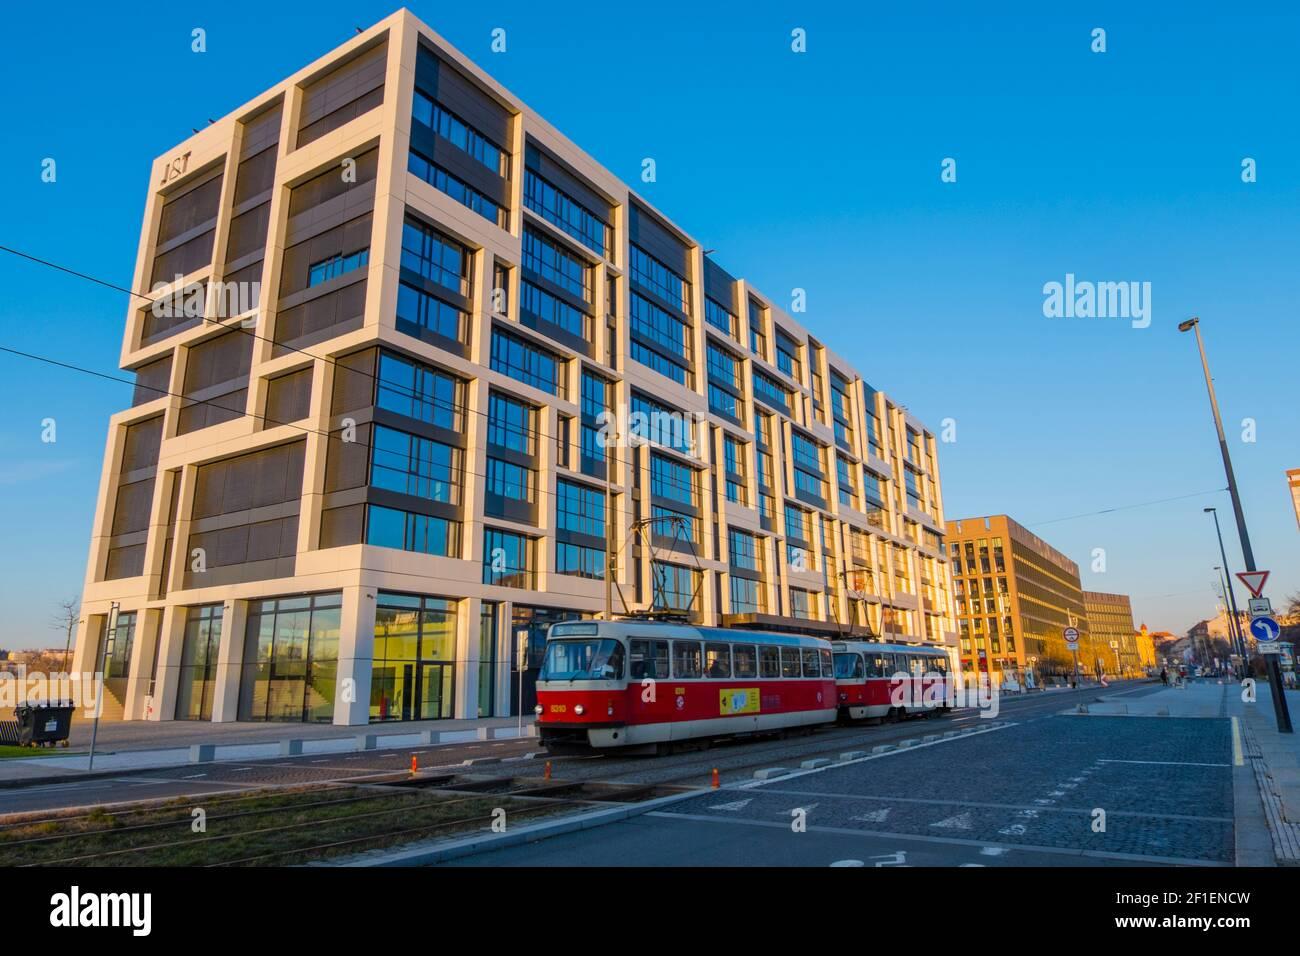 J&T Banka, Bürogebäude, Sokolovska, Karlin, Prag, Tschechische Republik Stockfoto